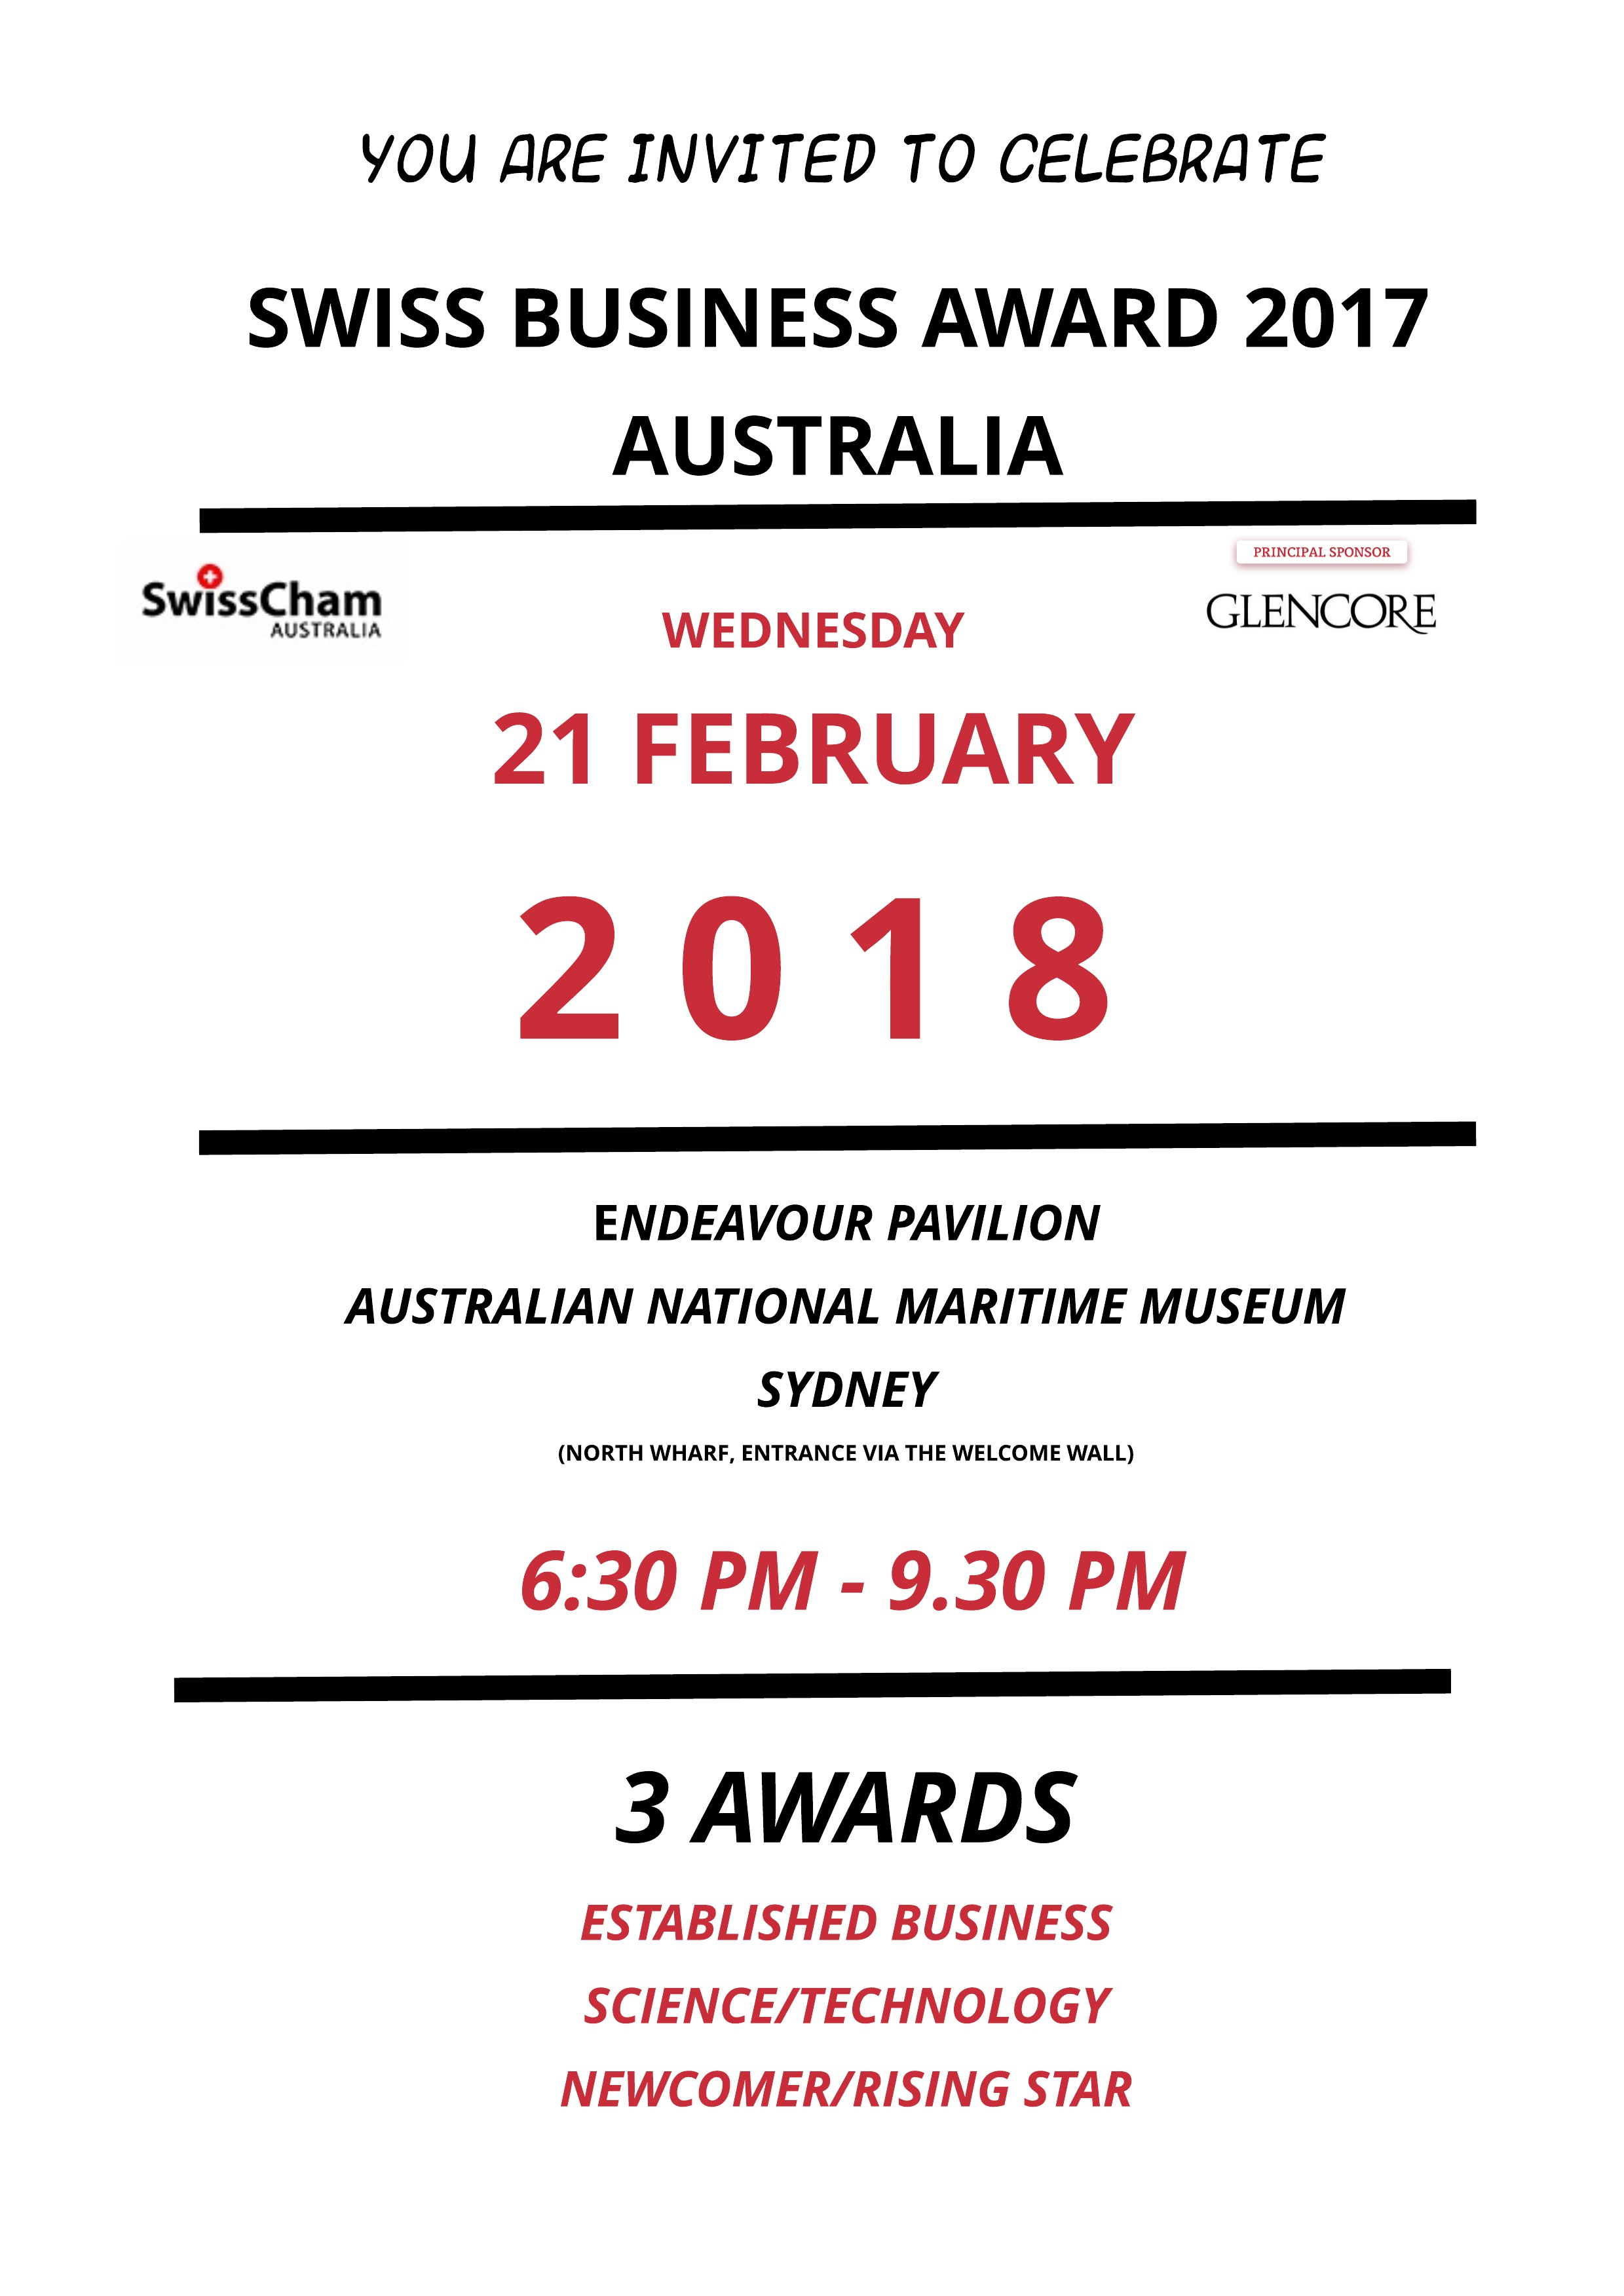 SWISS AWARD 2017 Invite-2.jpeg